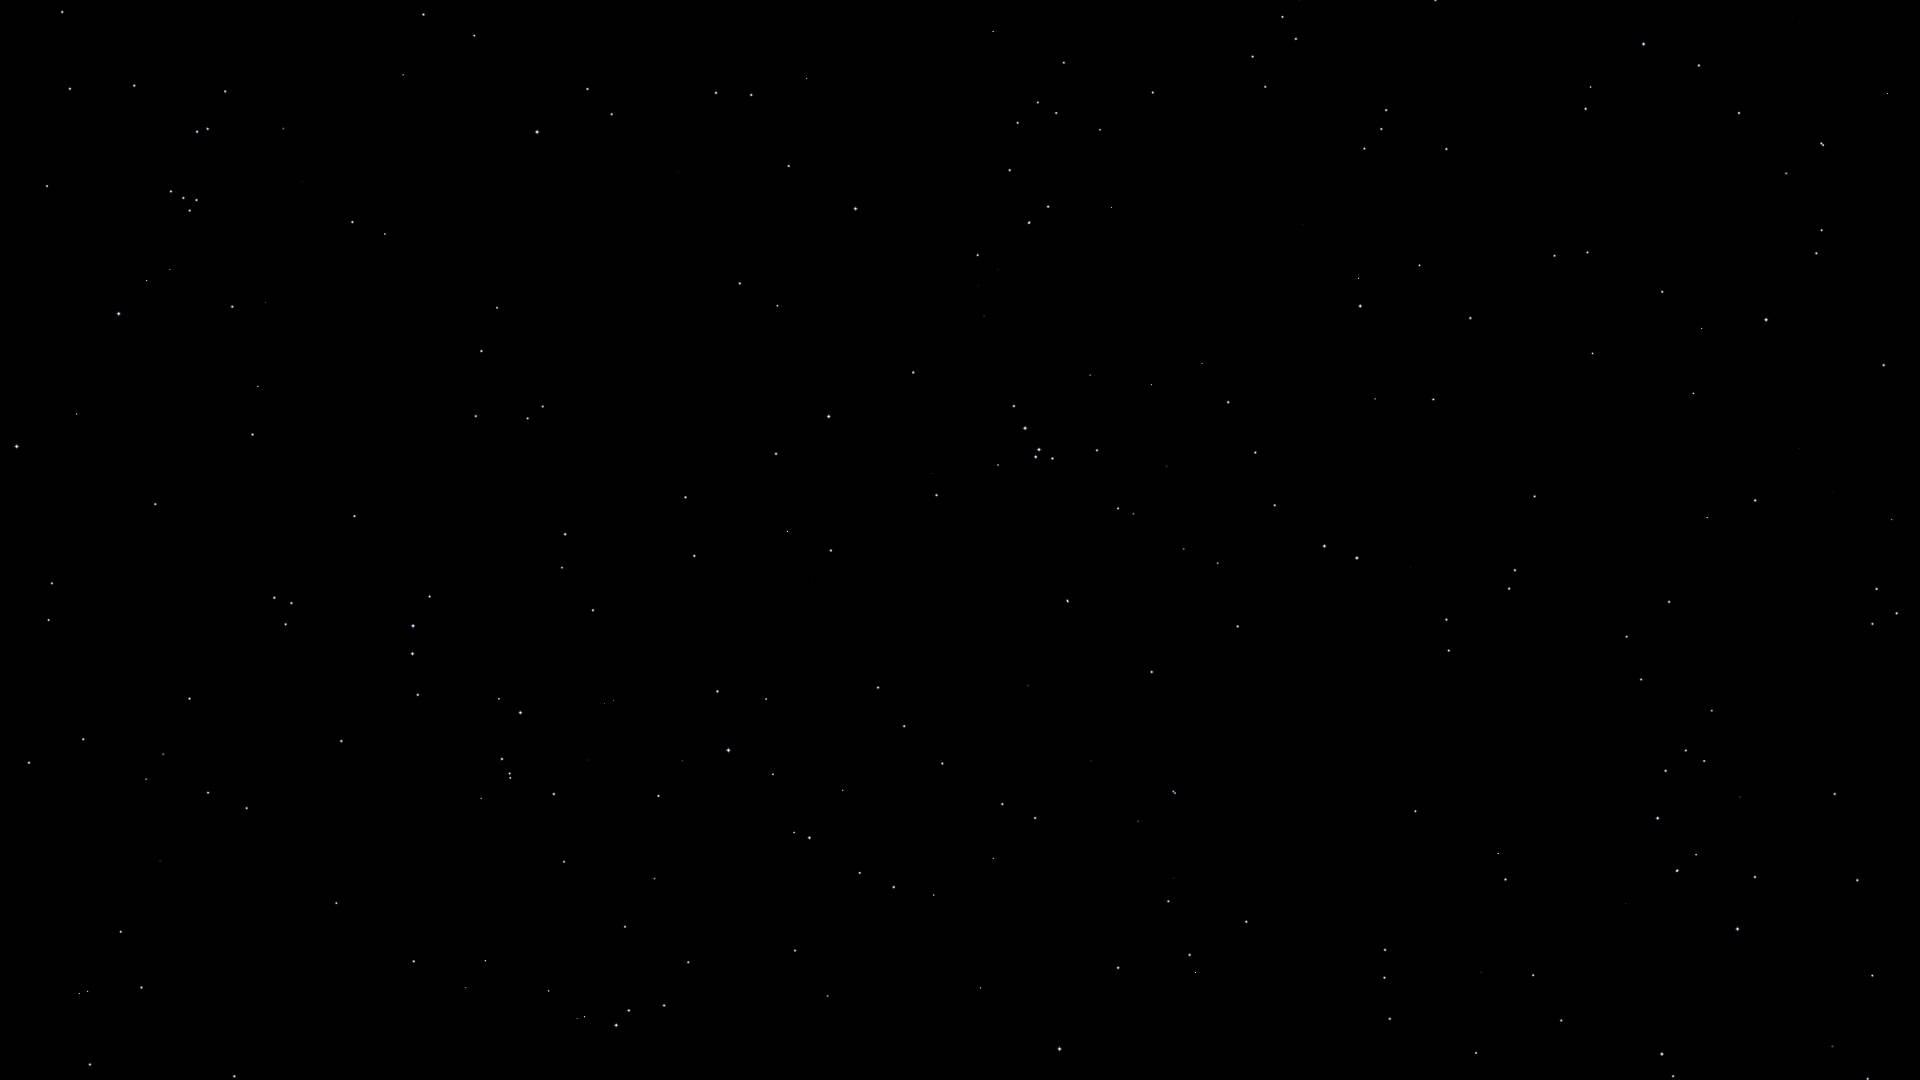 mySketch/bin/data/sky.jpg